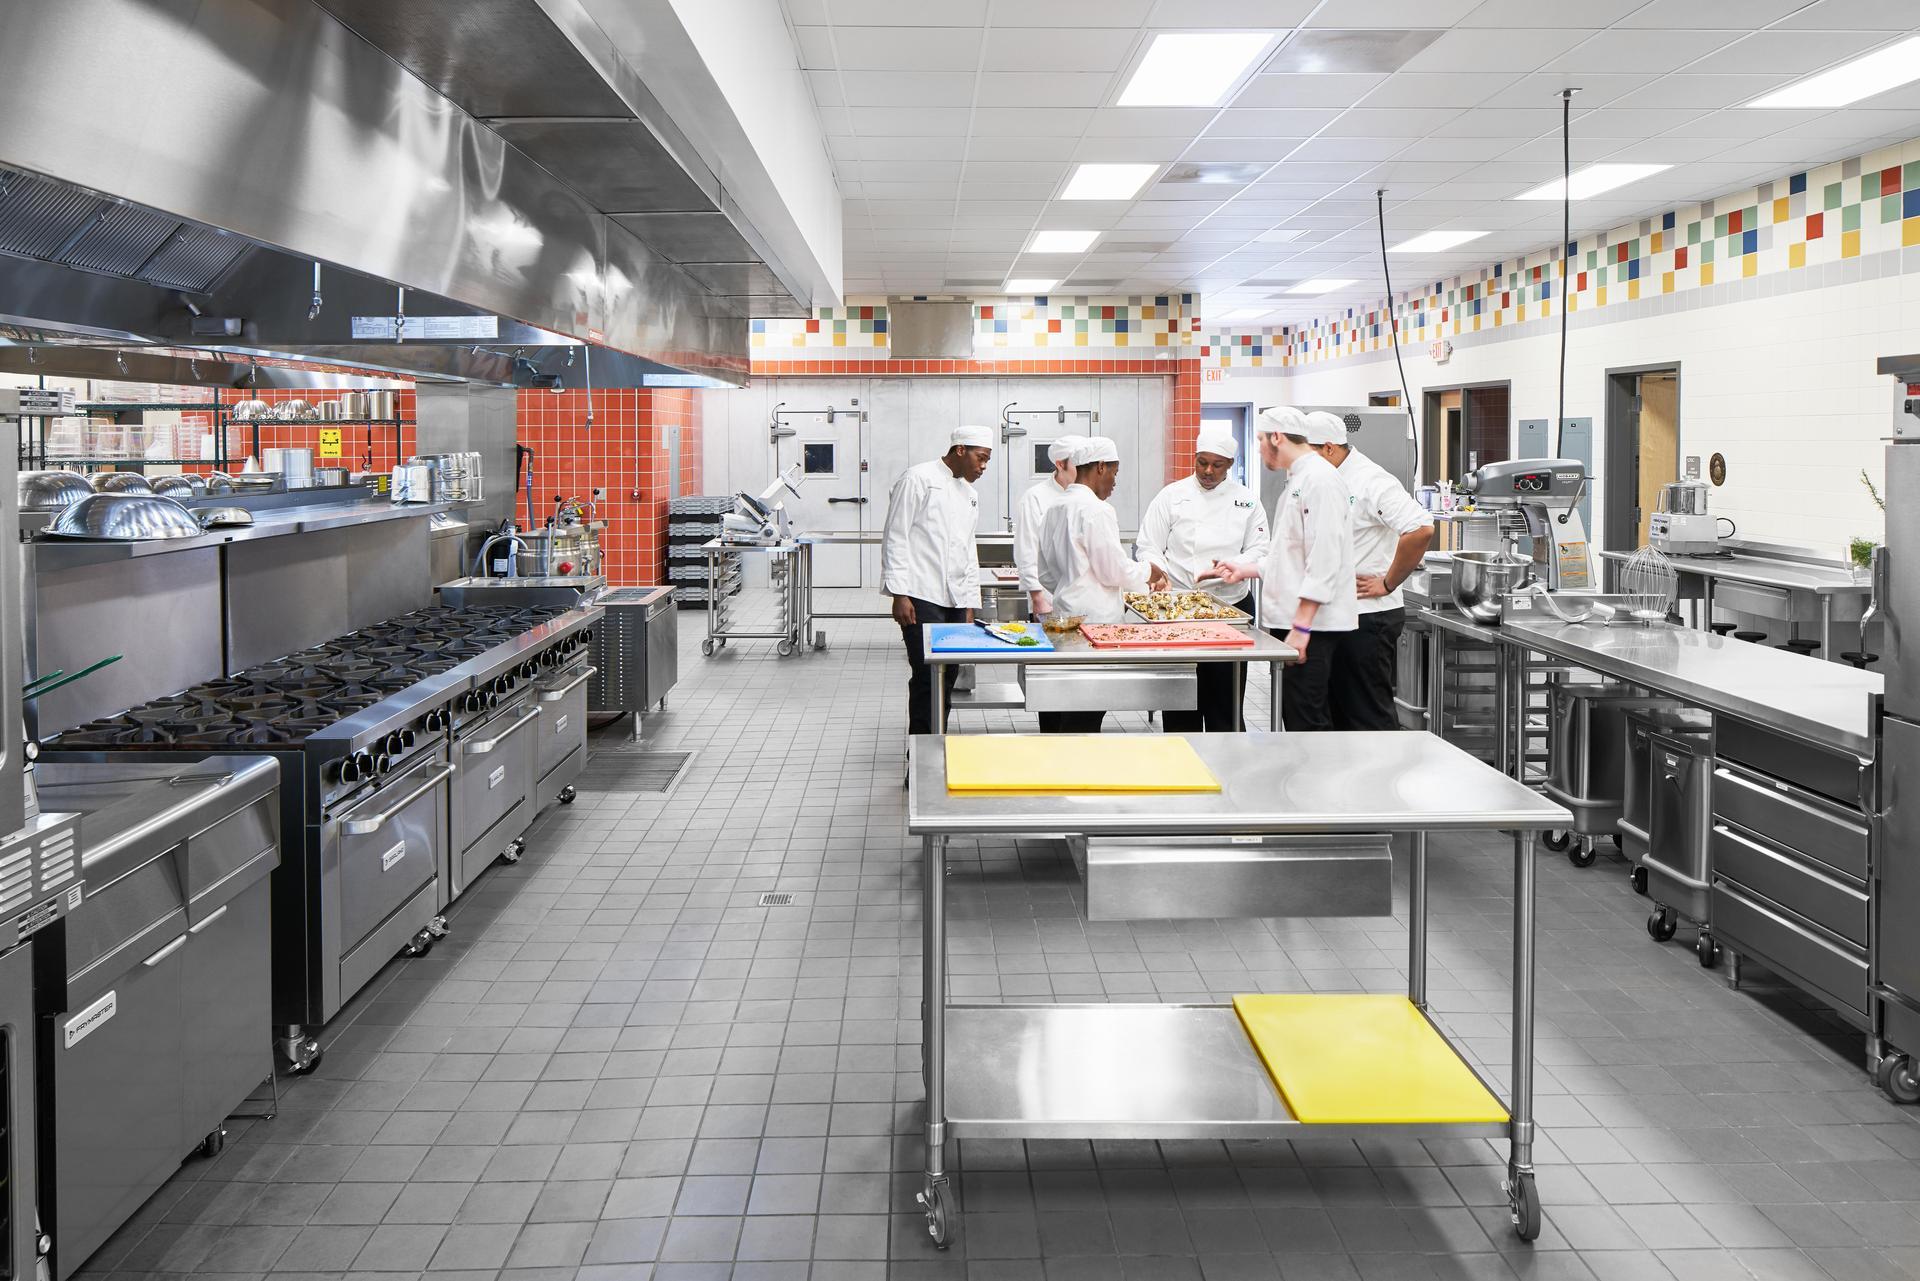 Lexington 2 Innovation Center Culinary Arts Kitchen